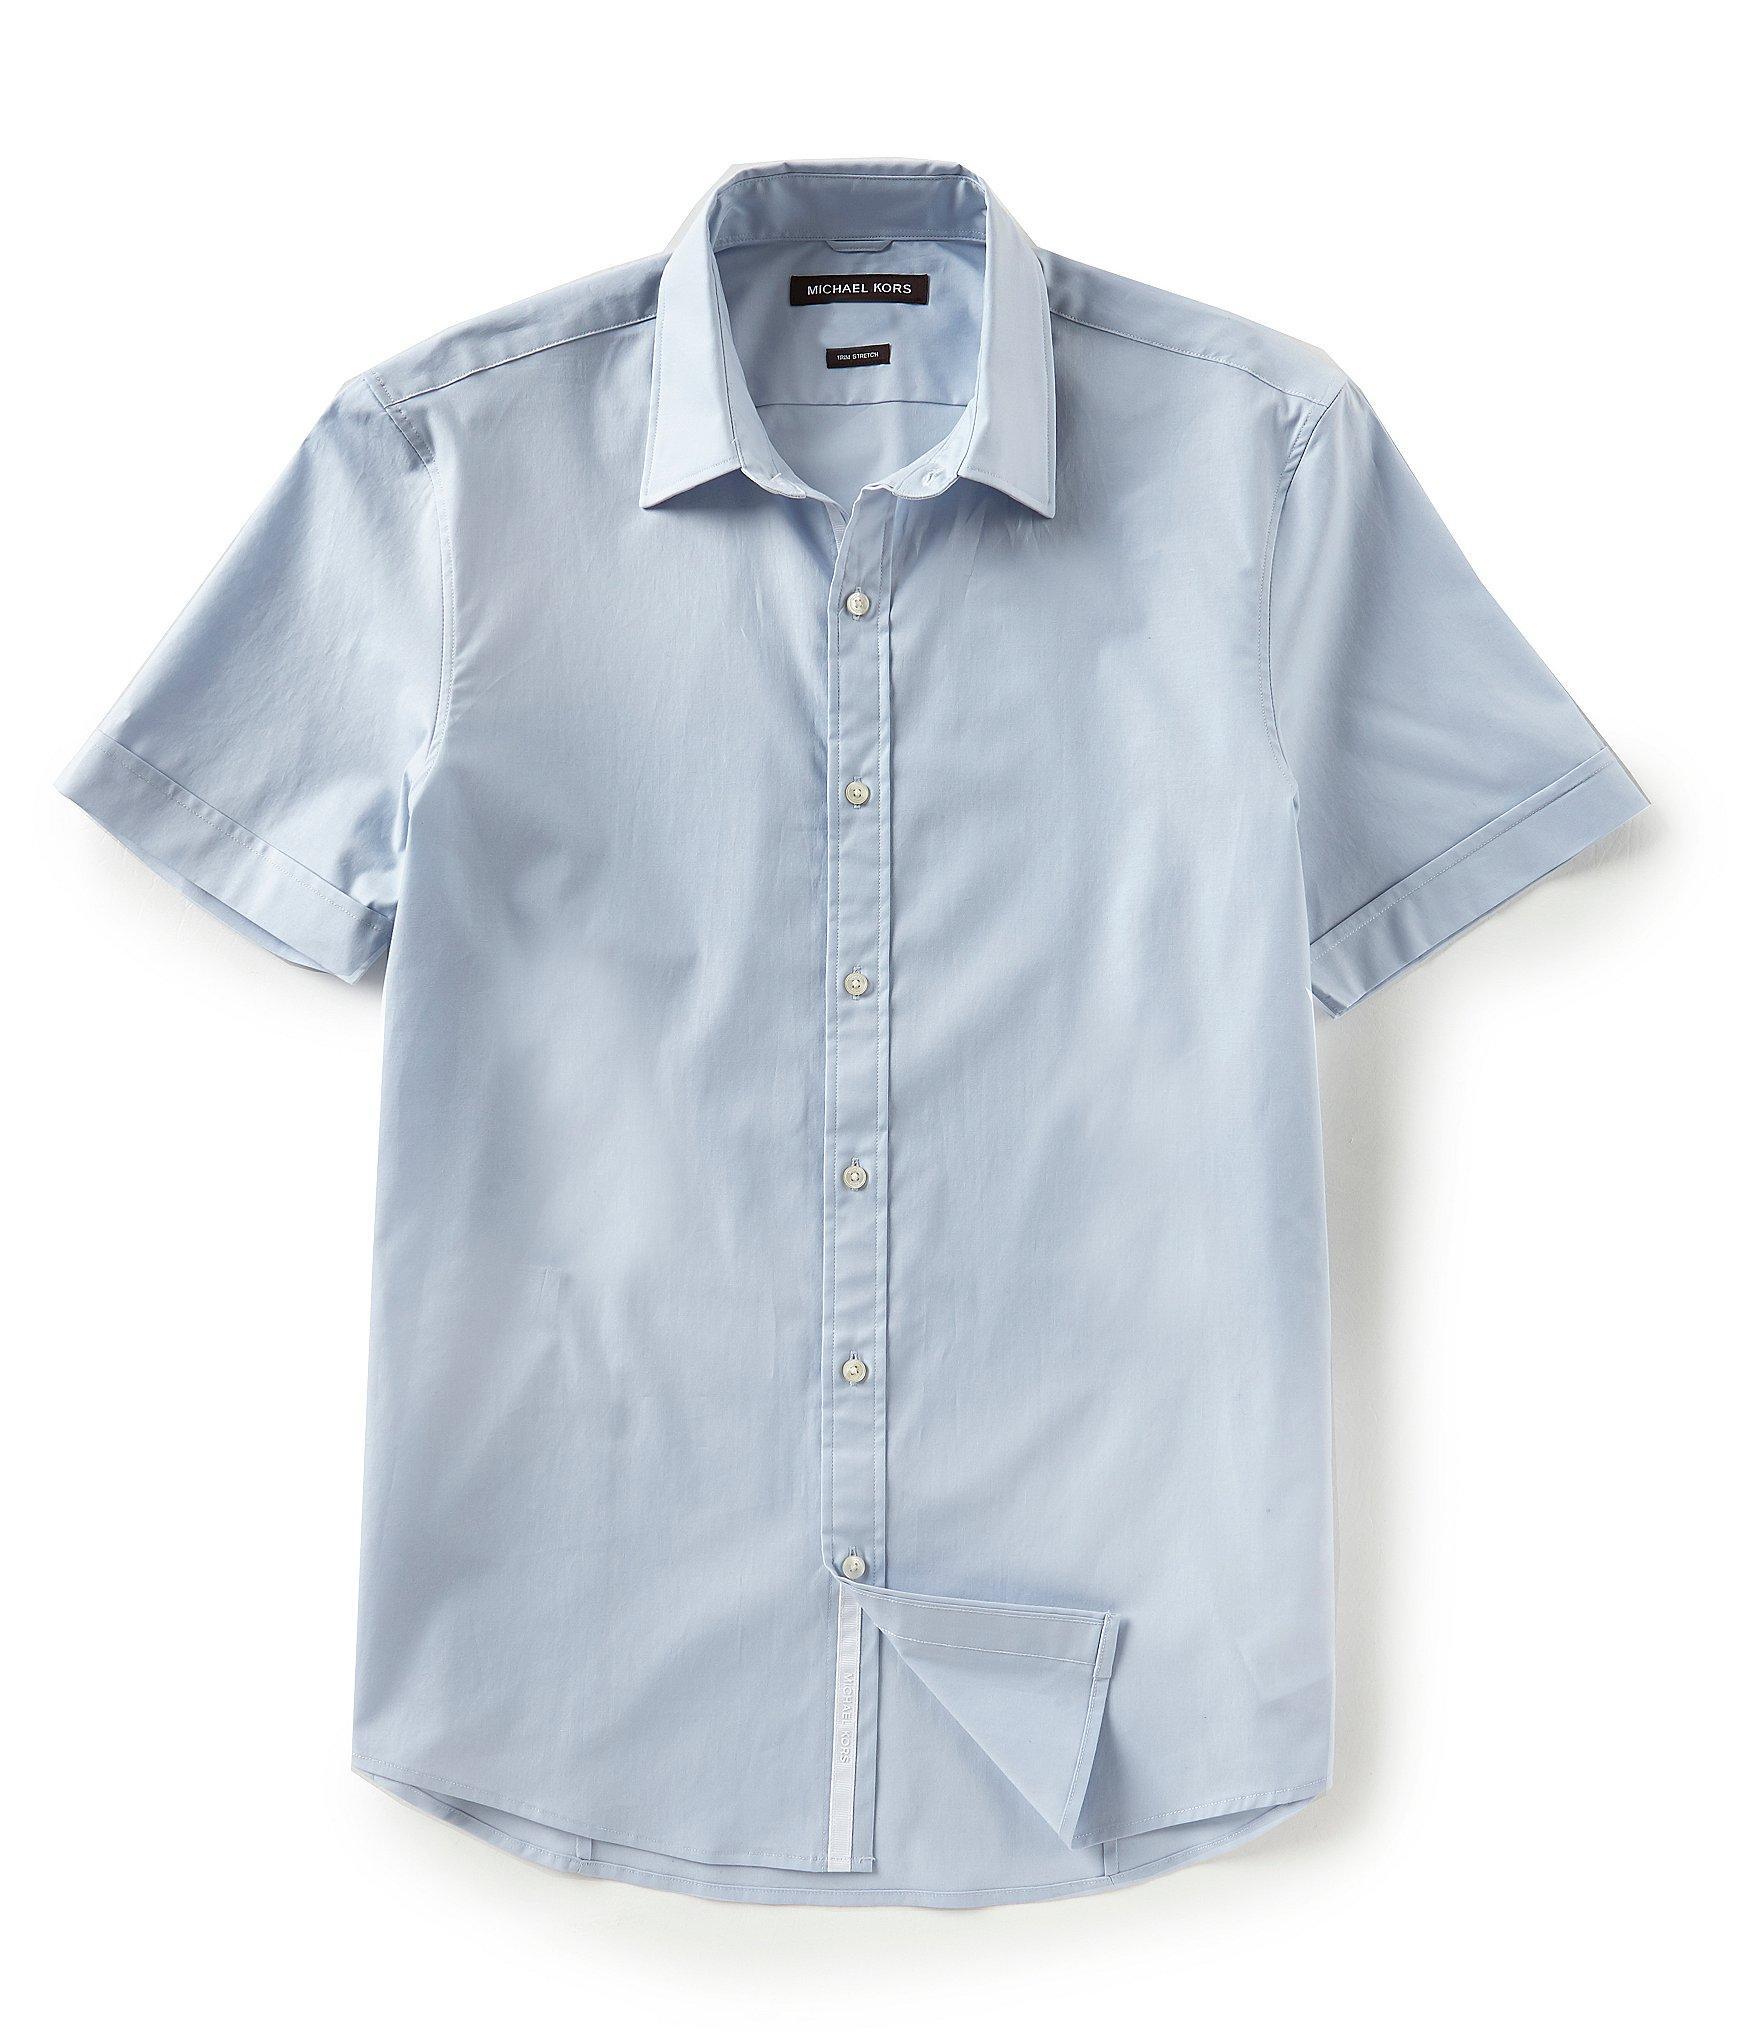 0b42e393eb5 Lyst - Michael Kors Slim-fit Solid Stretch Short-sleeve Woven Shirt ...